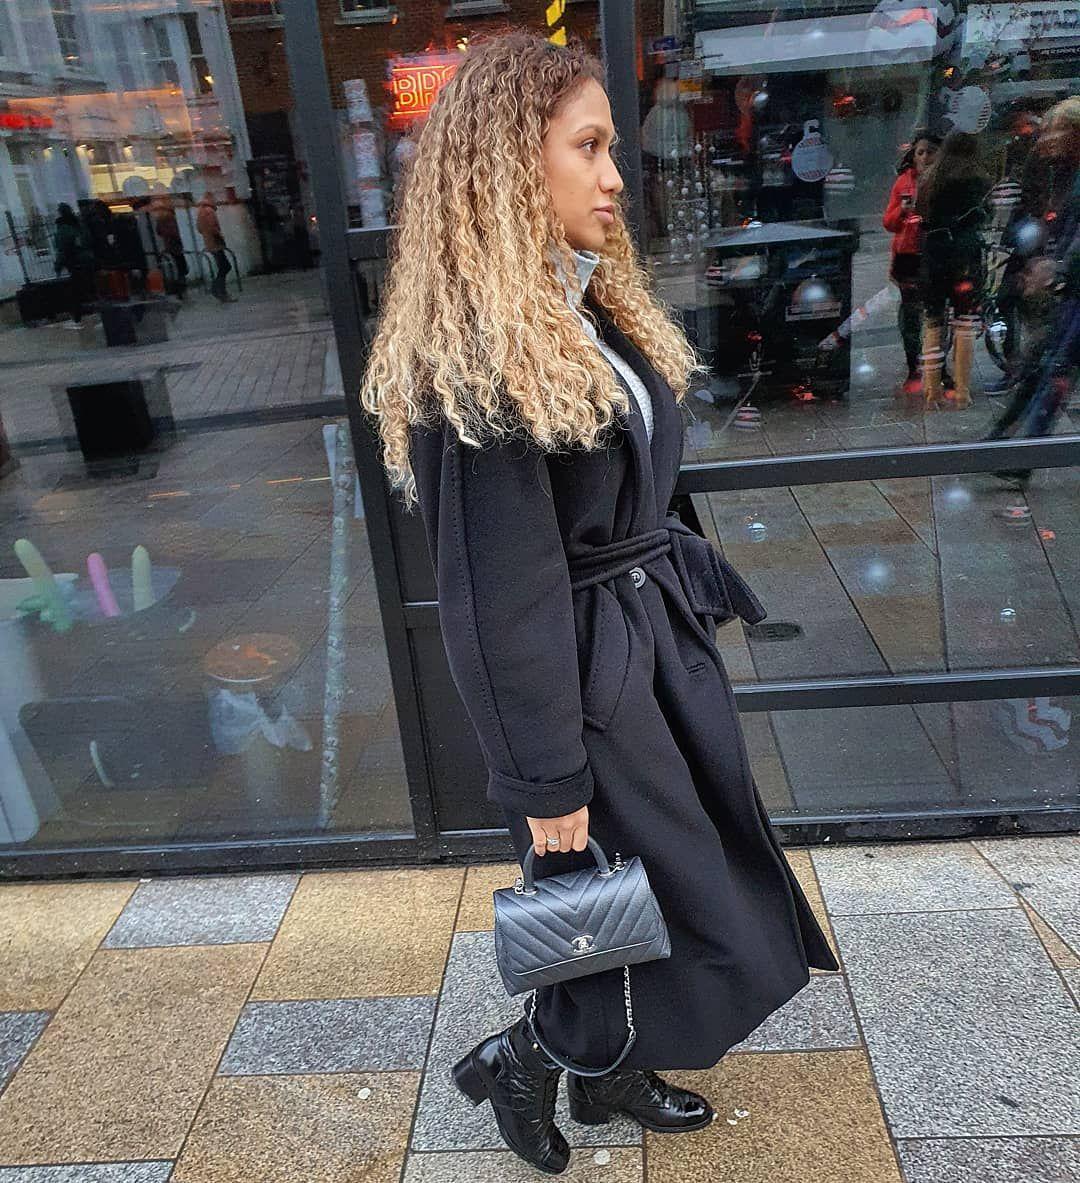 No one loves an oversized jacket the way I do ???????? • • • • • •  #styleinspiration #trendy #intimissimi #howtostyle #pumpkinpatch #bohemianlook #maxmarawomen #hermes #luxurylifestyle #maxmarateddybear #Minimalist #DressedUp #couture #urbanstyles #louisvuitton #OOTD #maxmaracoat #highfashion #currentlywearing #neutrals #stripes #casualstyle #casualoutfits #comfy #styleoftheday #autumntrends #pumpkinpatchoutfitwomen